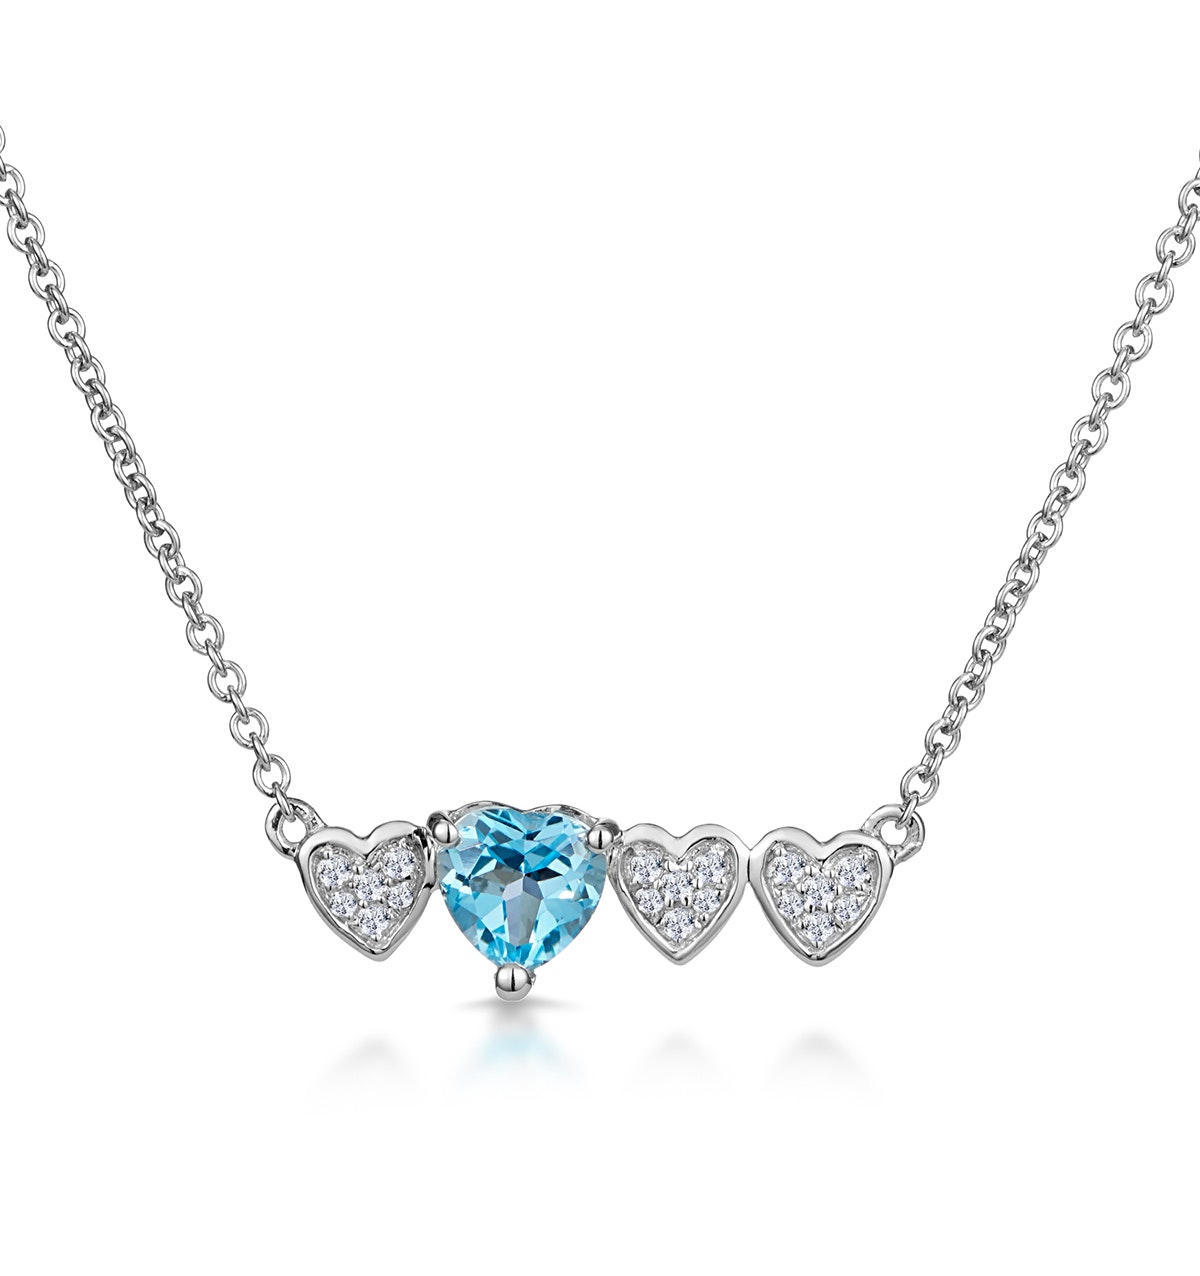 Swiss Blue Topaz and Diamond Stellato Heart Necklace in 9K White Gold